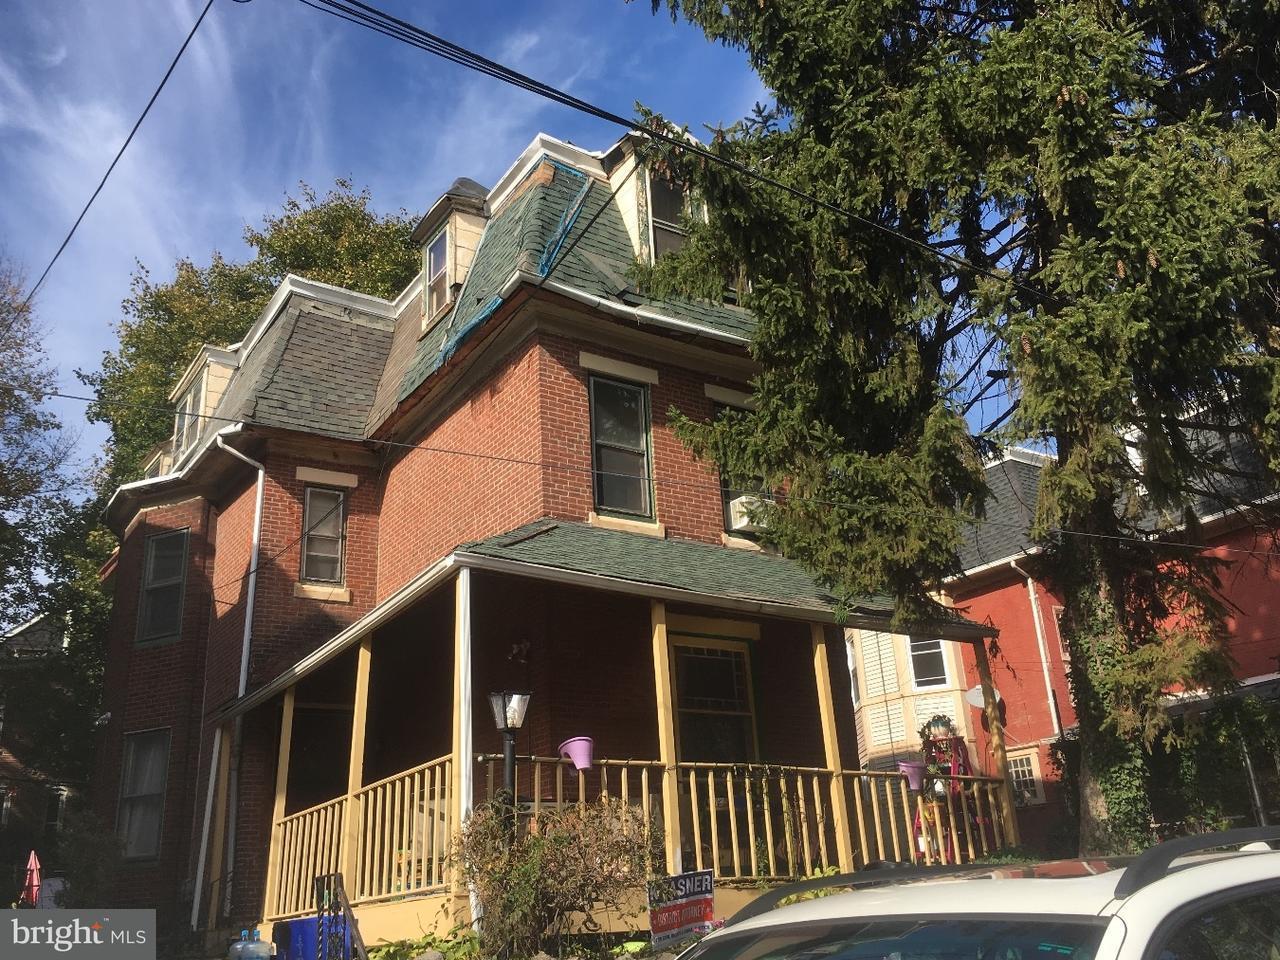 307 W Earlham Philadelphia, PA 19144